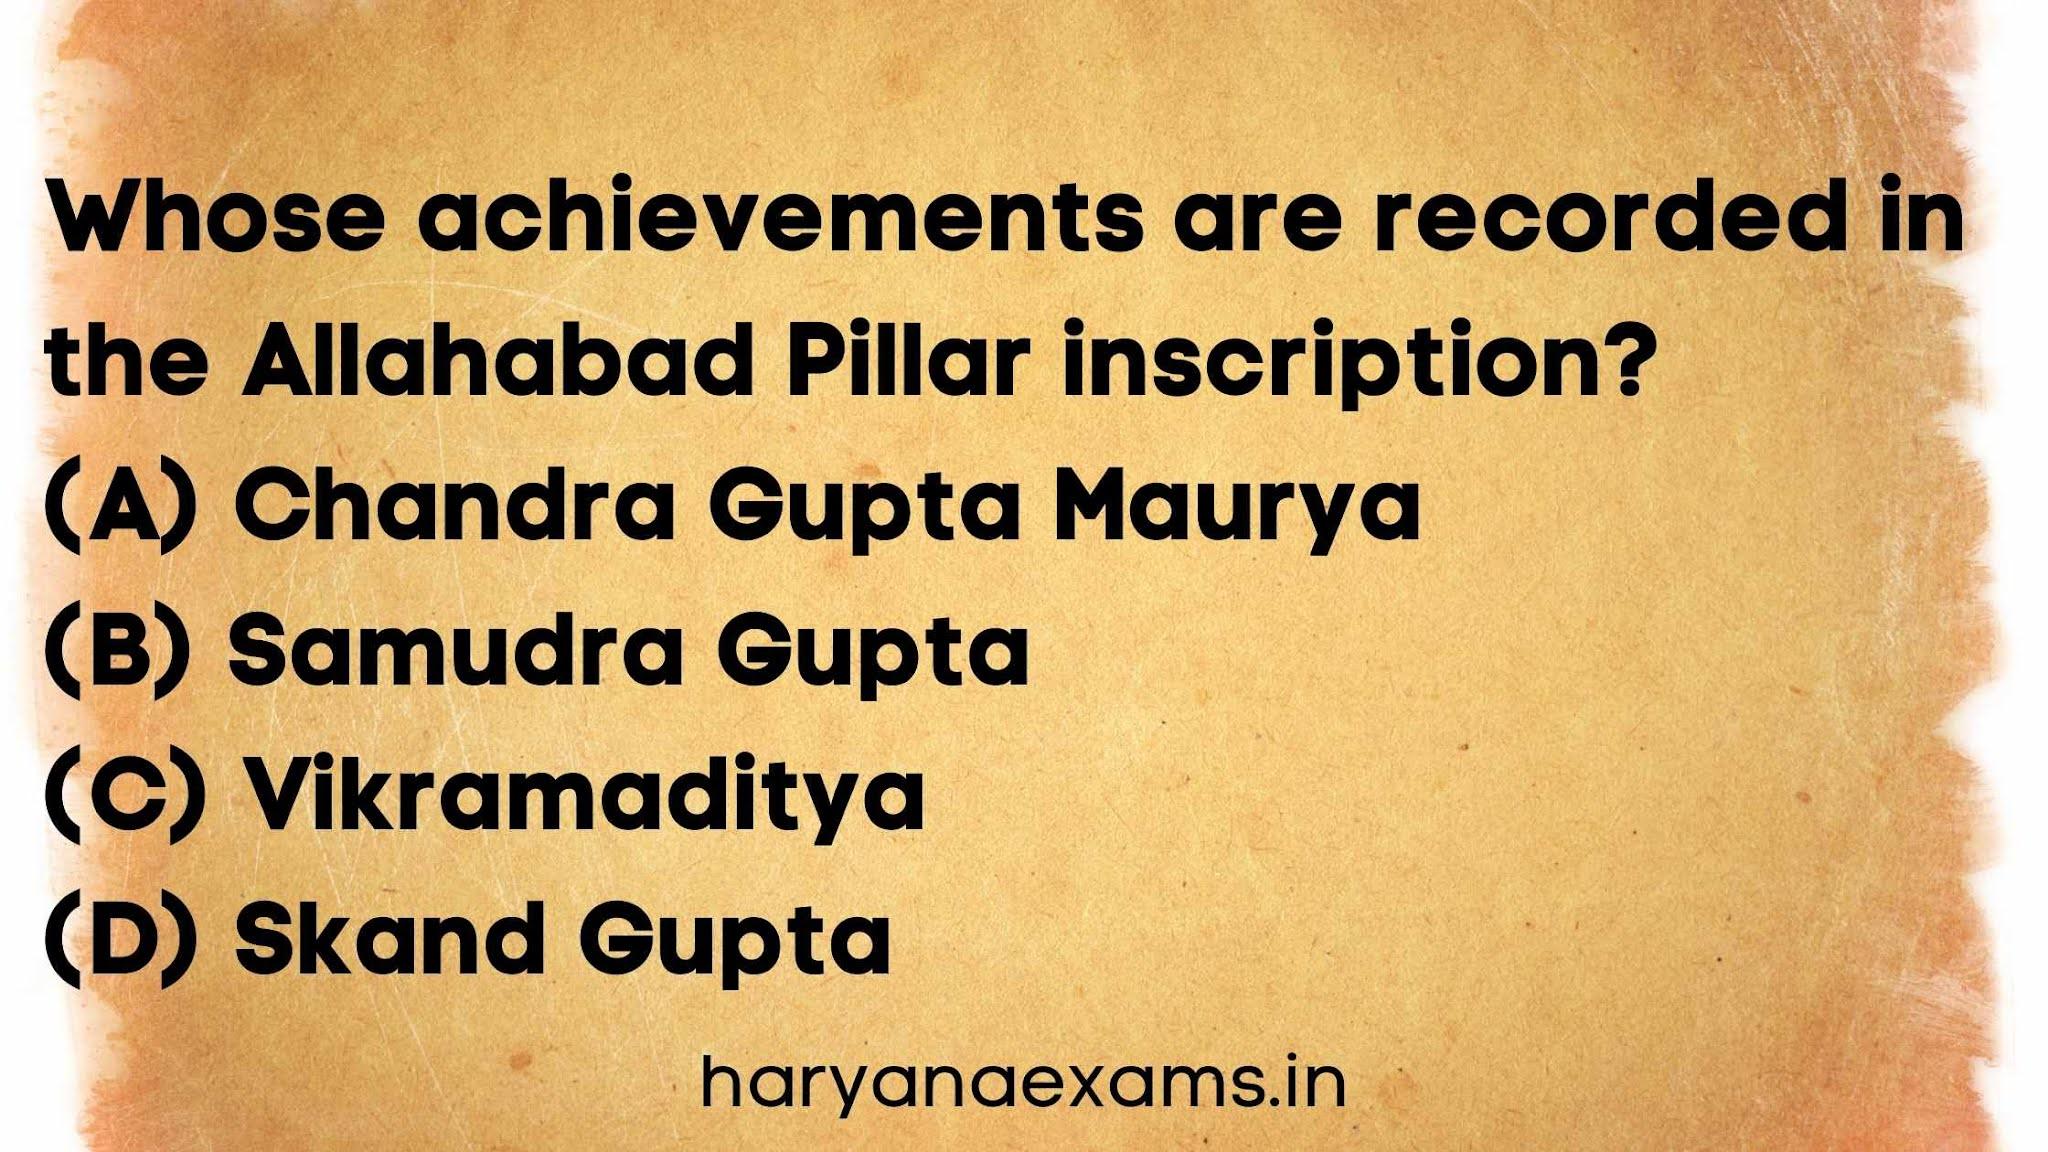 Whose achievements are recorded in the Allahabad Pillar inscription?   (A) Chandra Gupta Maurya   (B) Samudra Gupta   (C) Vikramaditya   (D) Skand Gupta